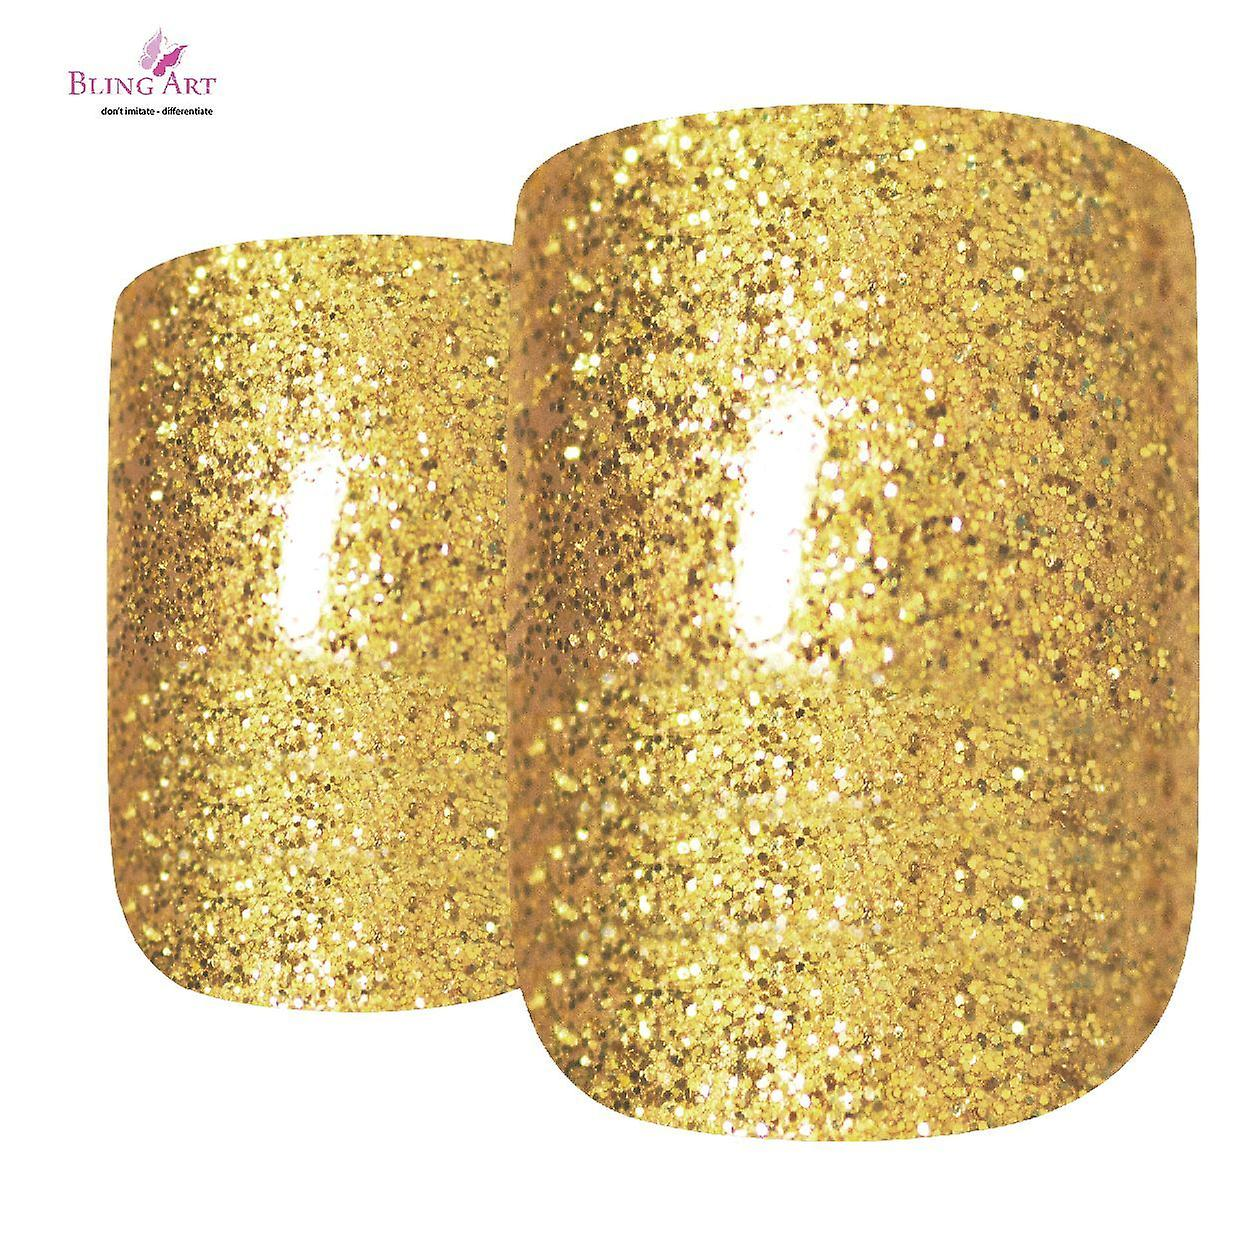 False nails by bling art gold glitter french squoval 24 fake medium acrylic tips